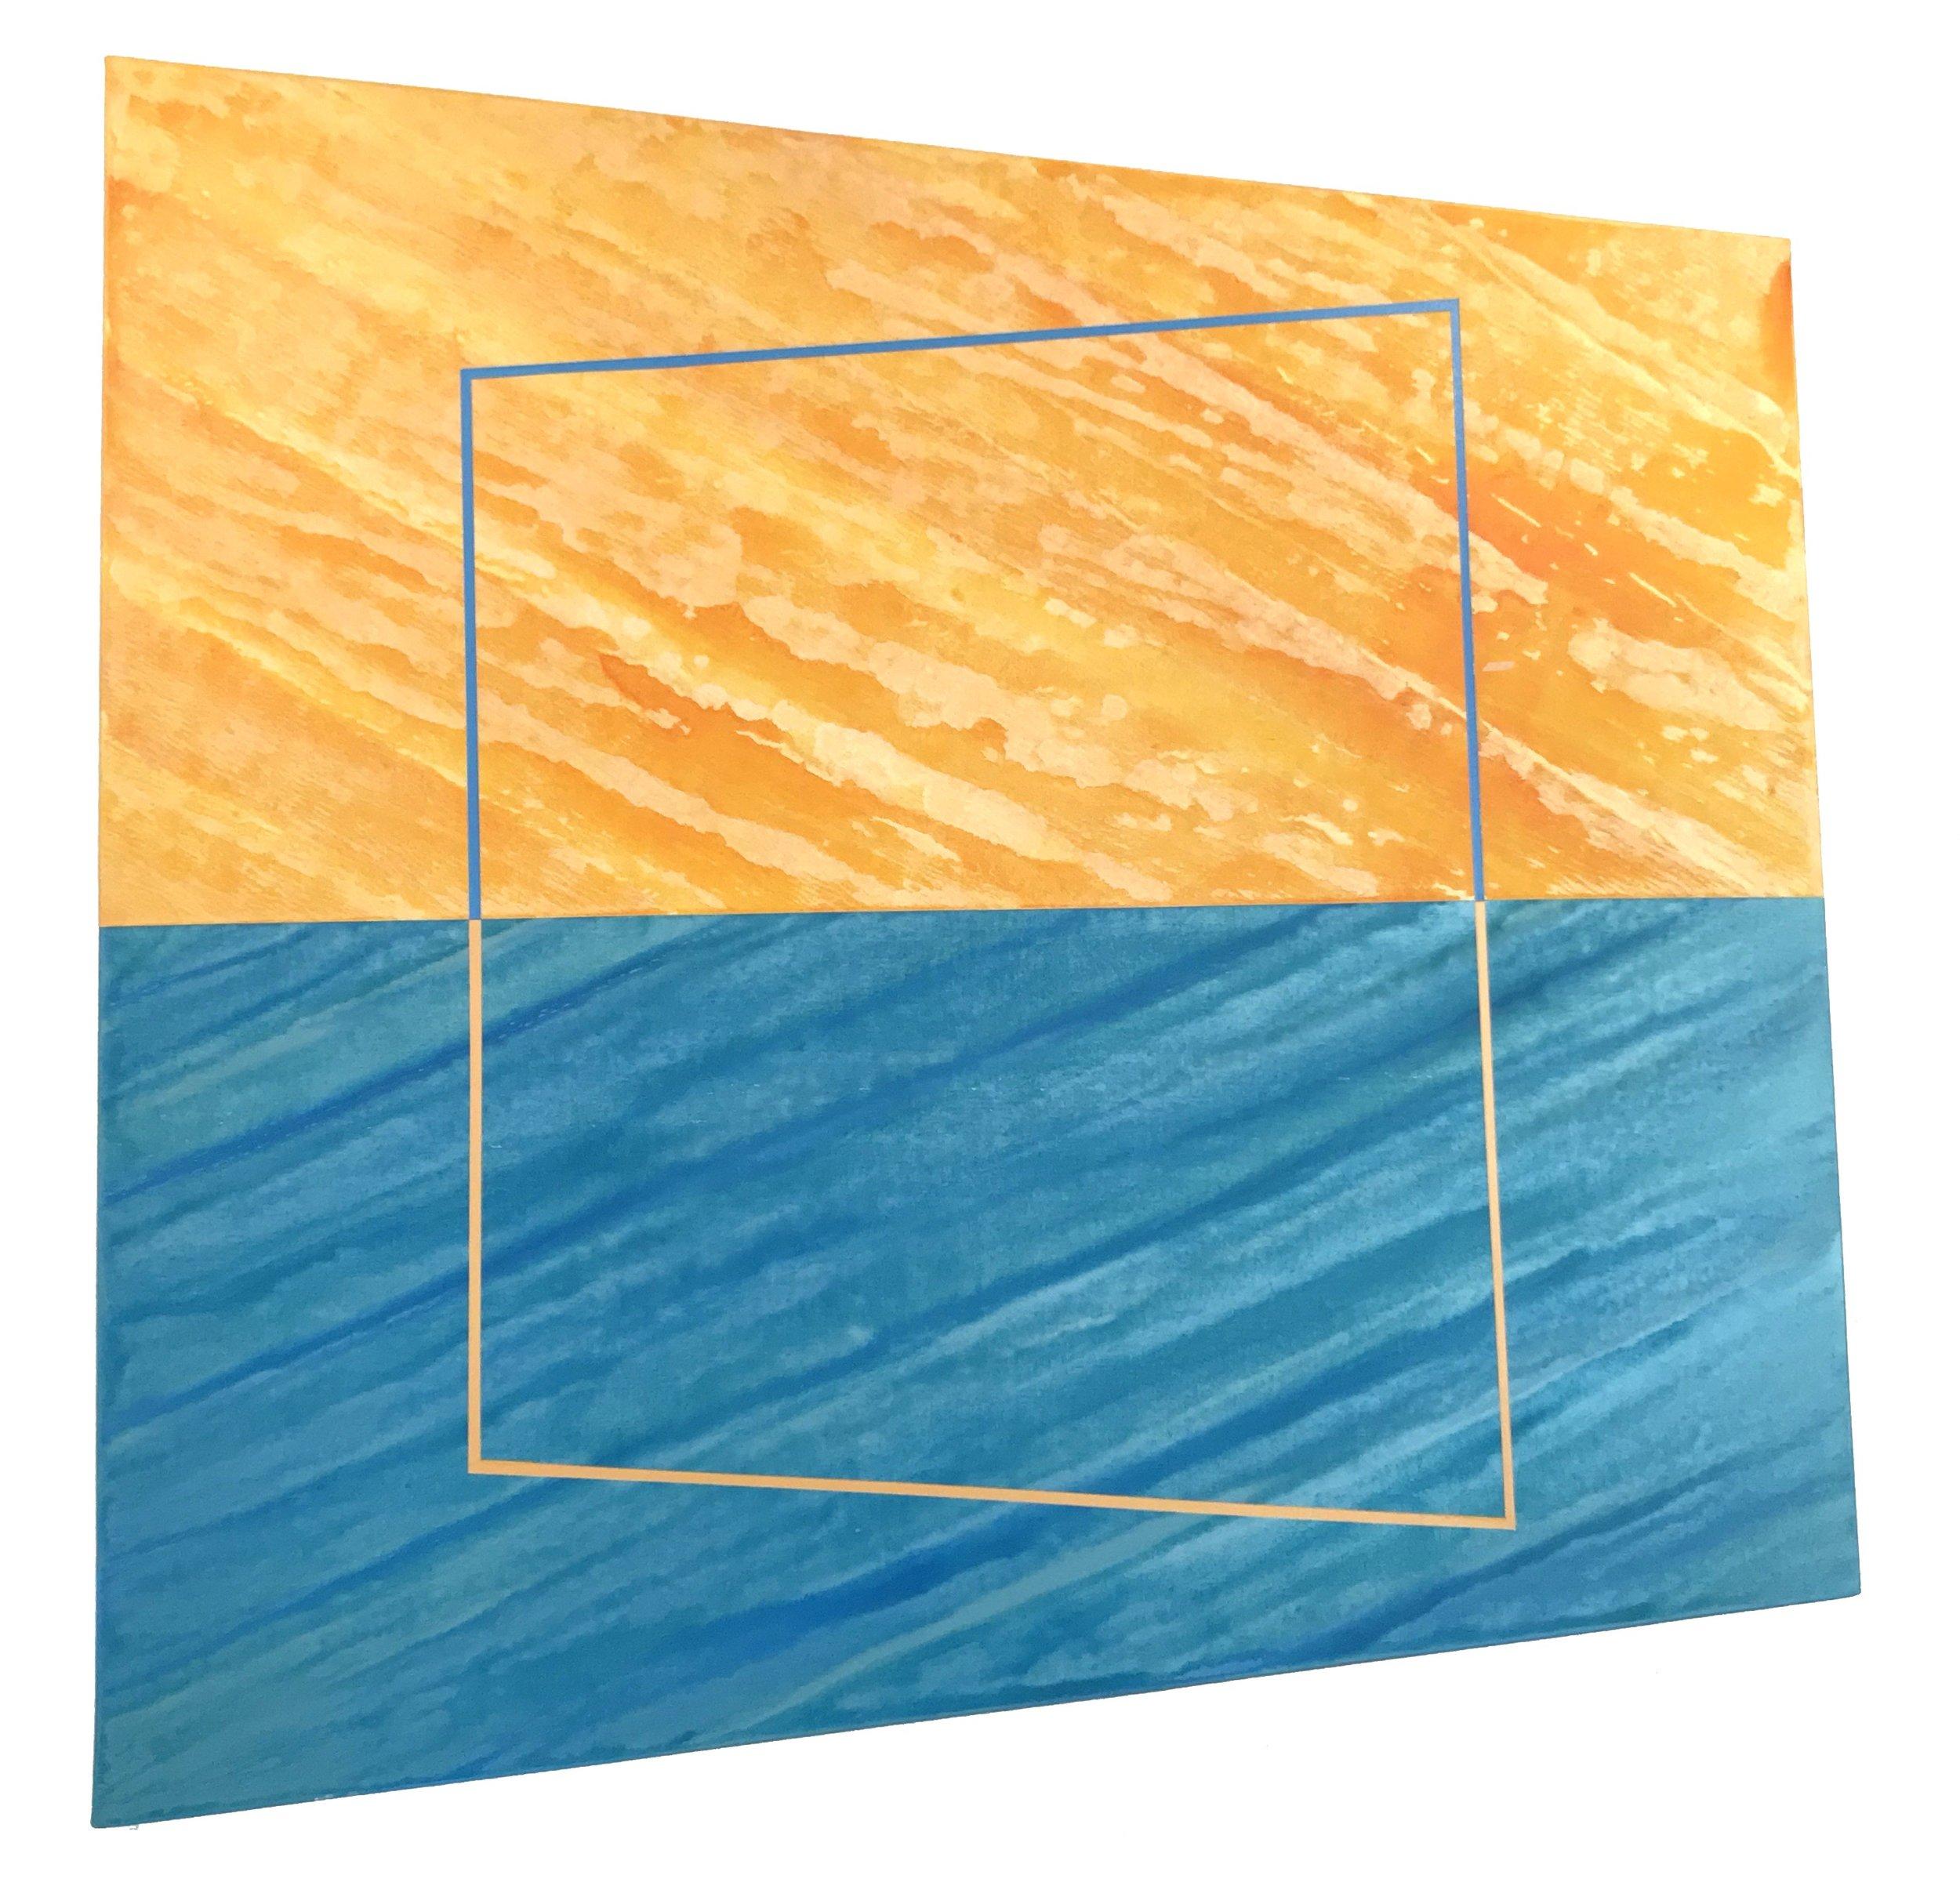 "Torque 1, 48"" x 48"", 2018, acrylic on canvas over panel"